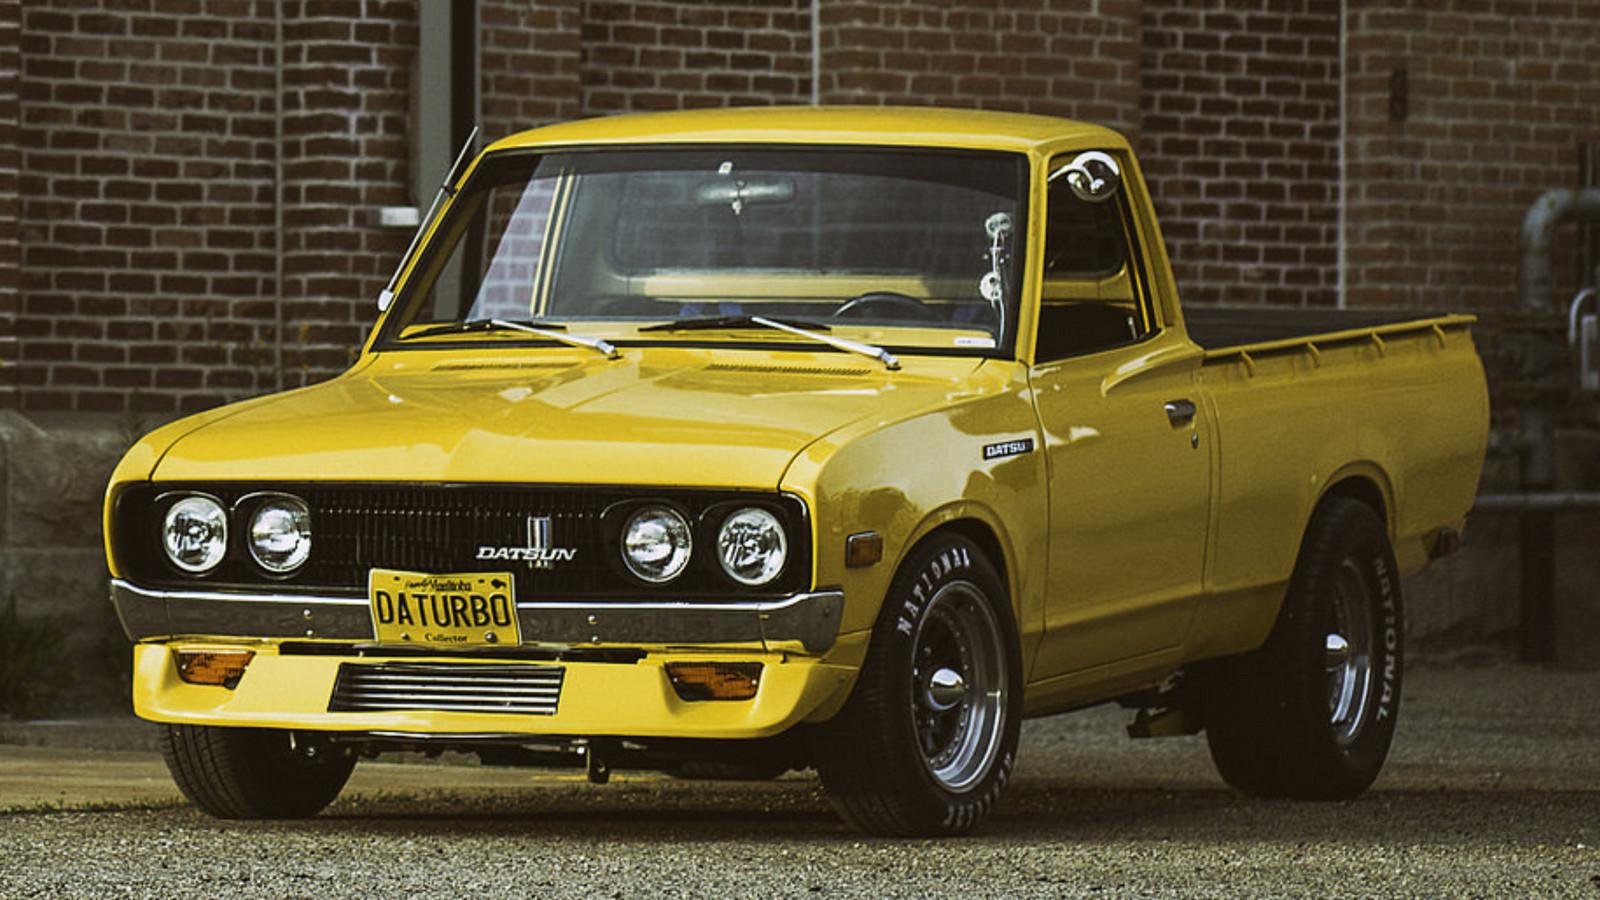 Datsun 60 Pick Up 1600x900 Wallpaper Teahub Io